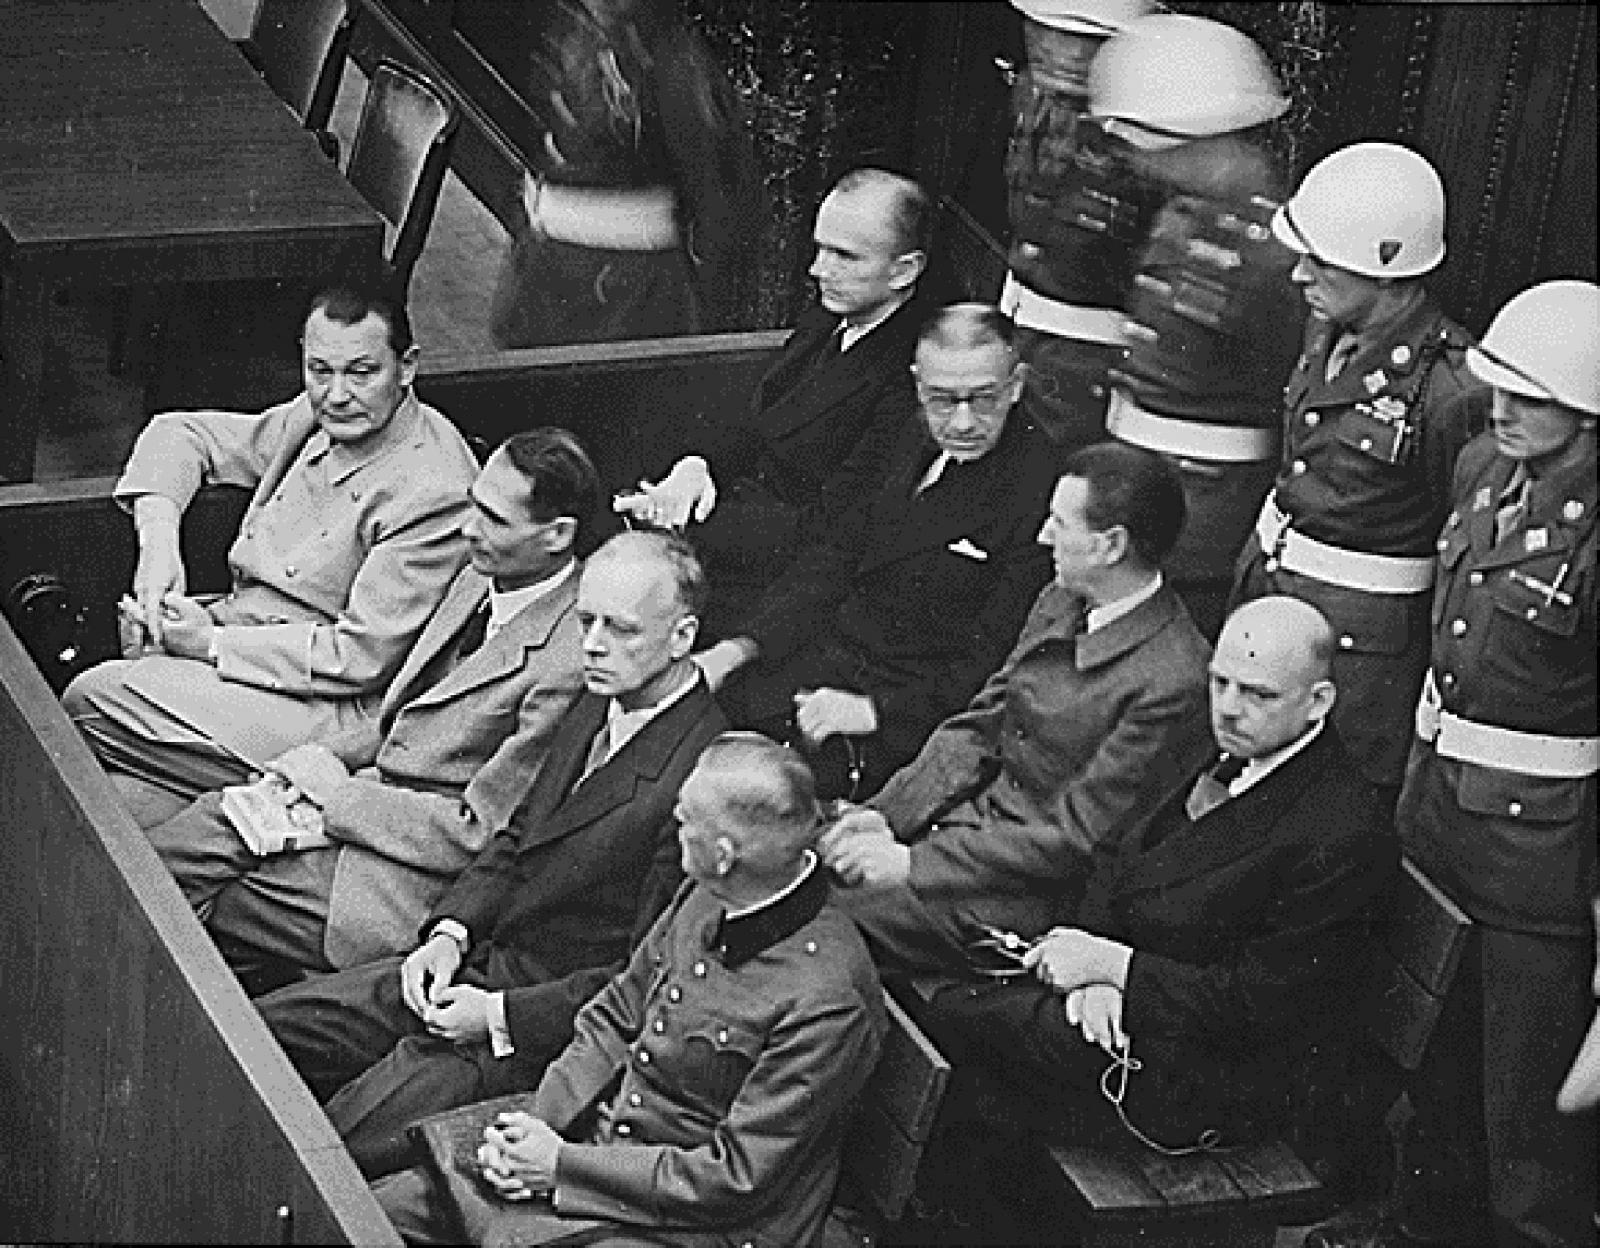 Nazi defendants (L-R front row) Hermann G?ring, Rudolf Hess, Joachim von Ribbentrop and Wilhelm Keitel sit in the dock of their war crimes trial at Nuremberg circa 1945-1946.